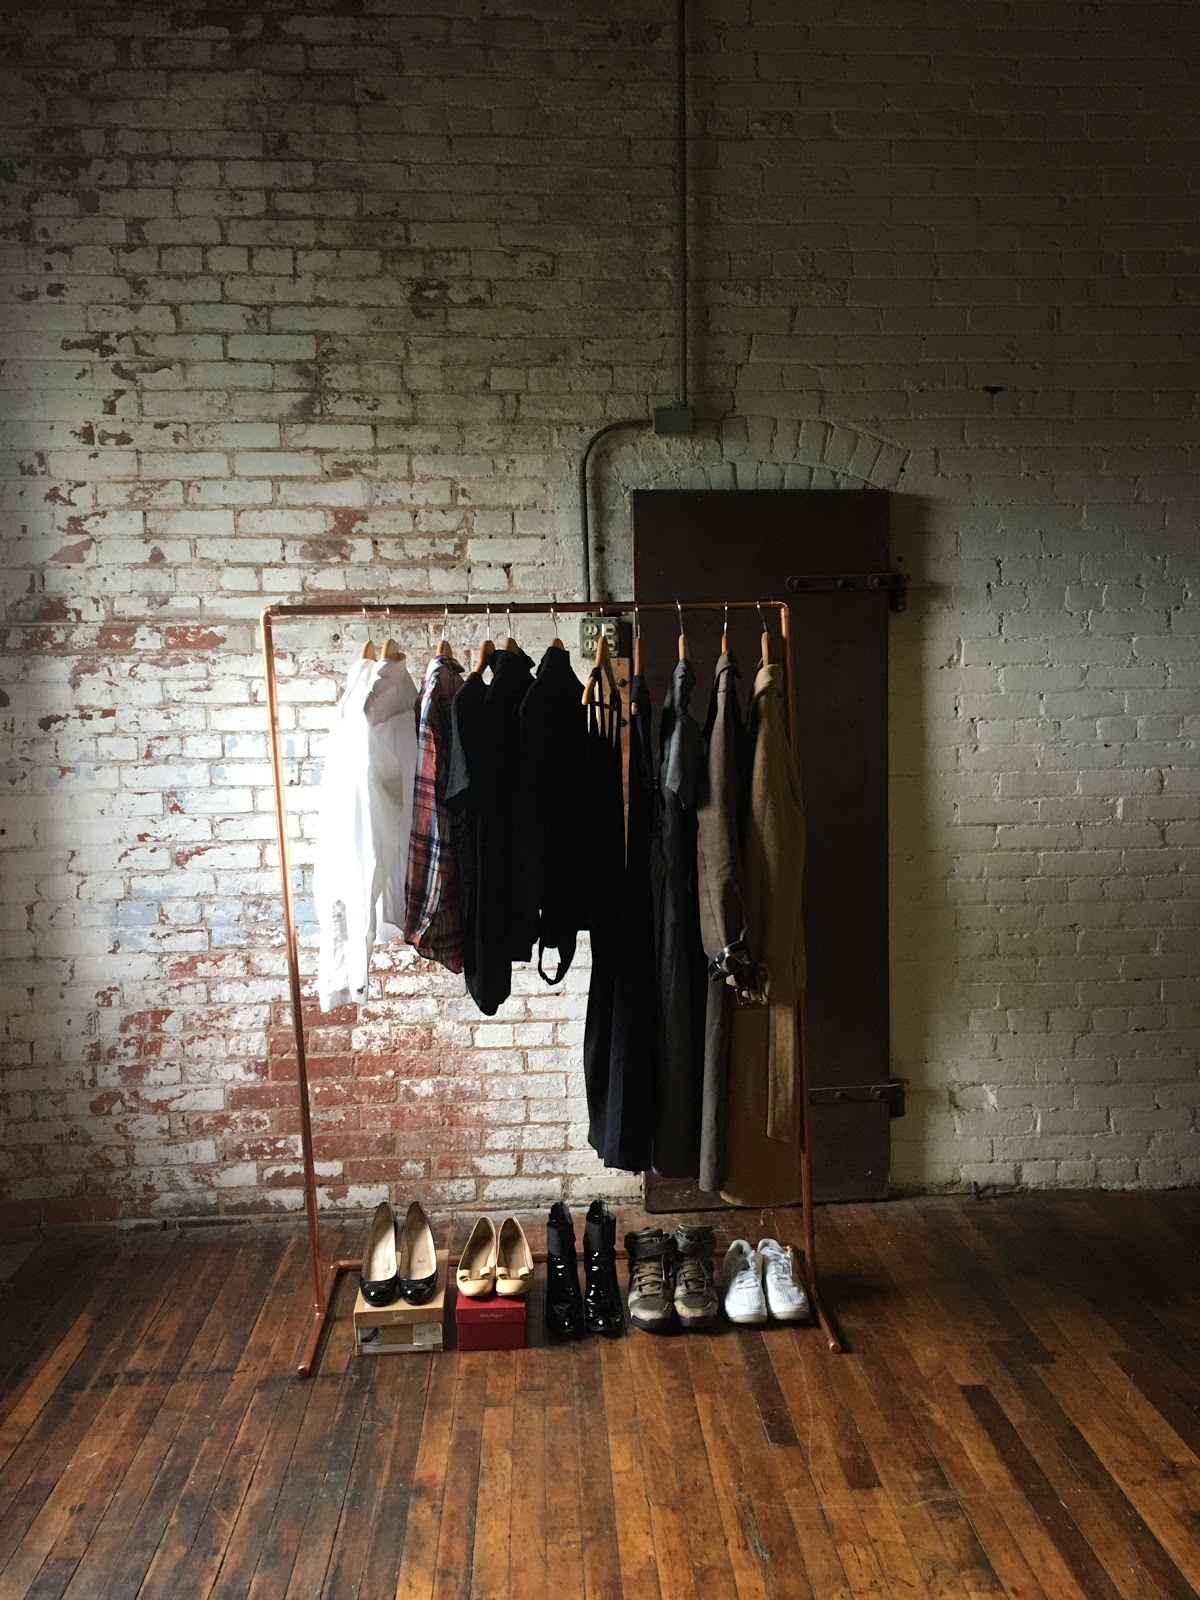 Paris To Go Diy Minimalist Copper Clothes Rack